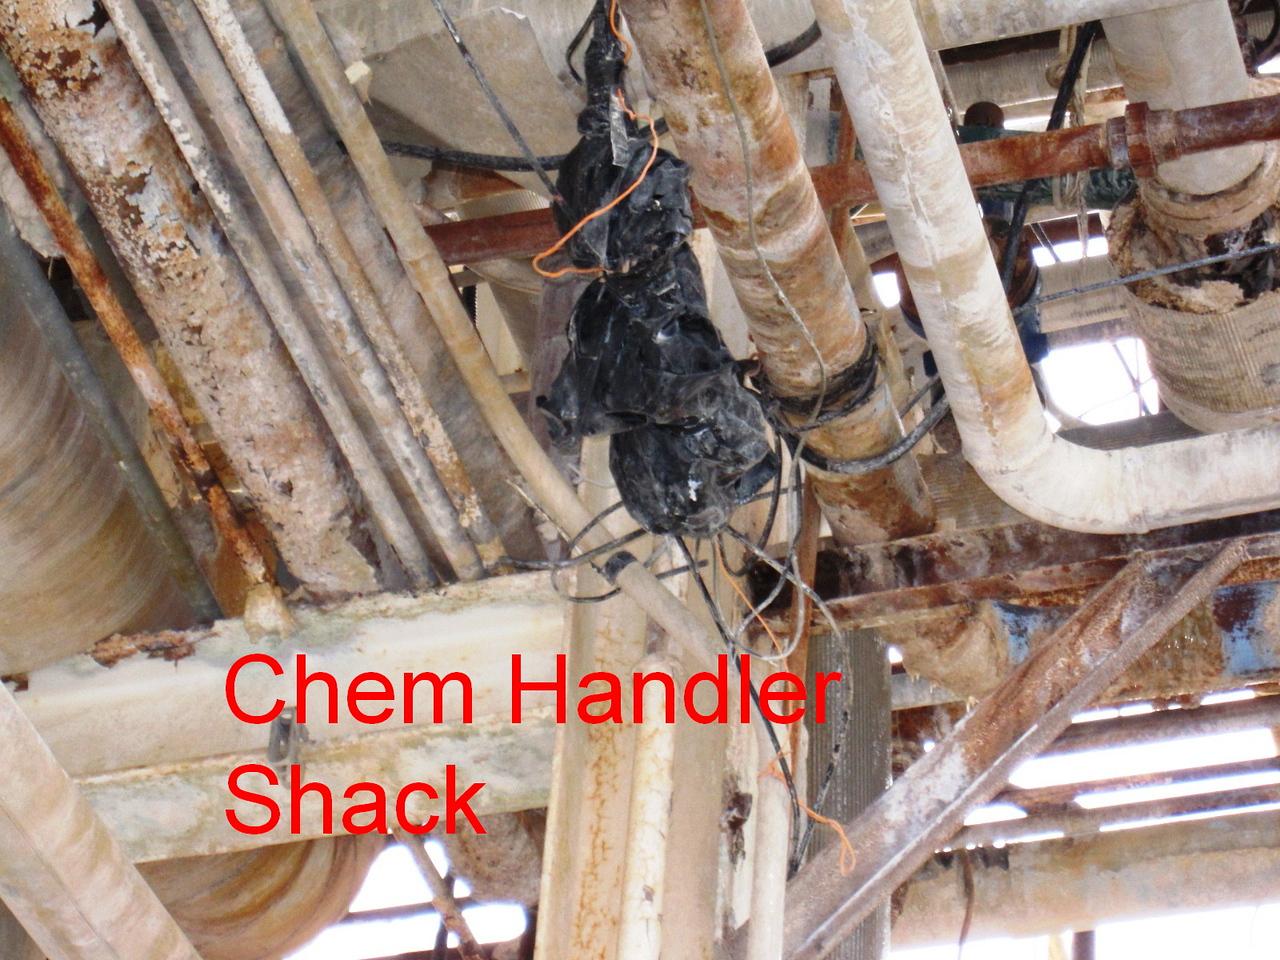 Chemical Handler Shack aerial junction